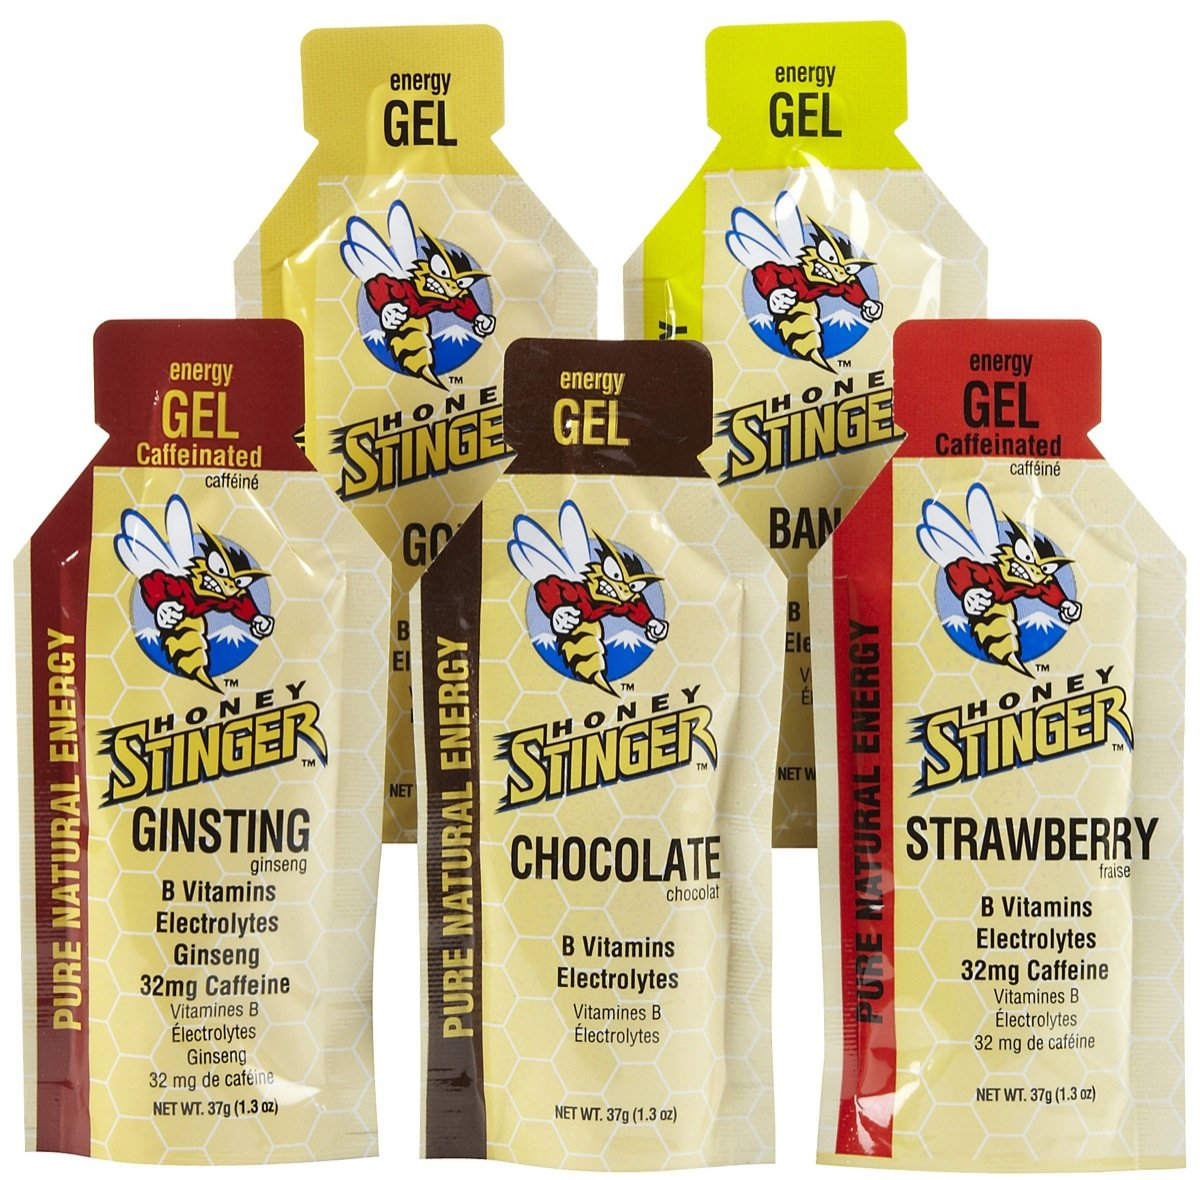 honey_stinger_bicycling_energy_gel